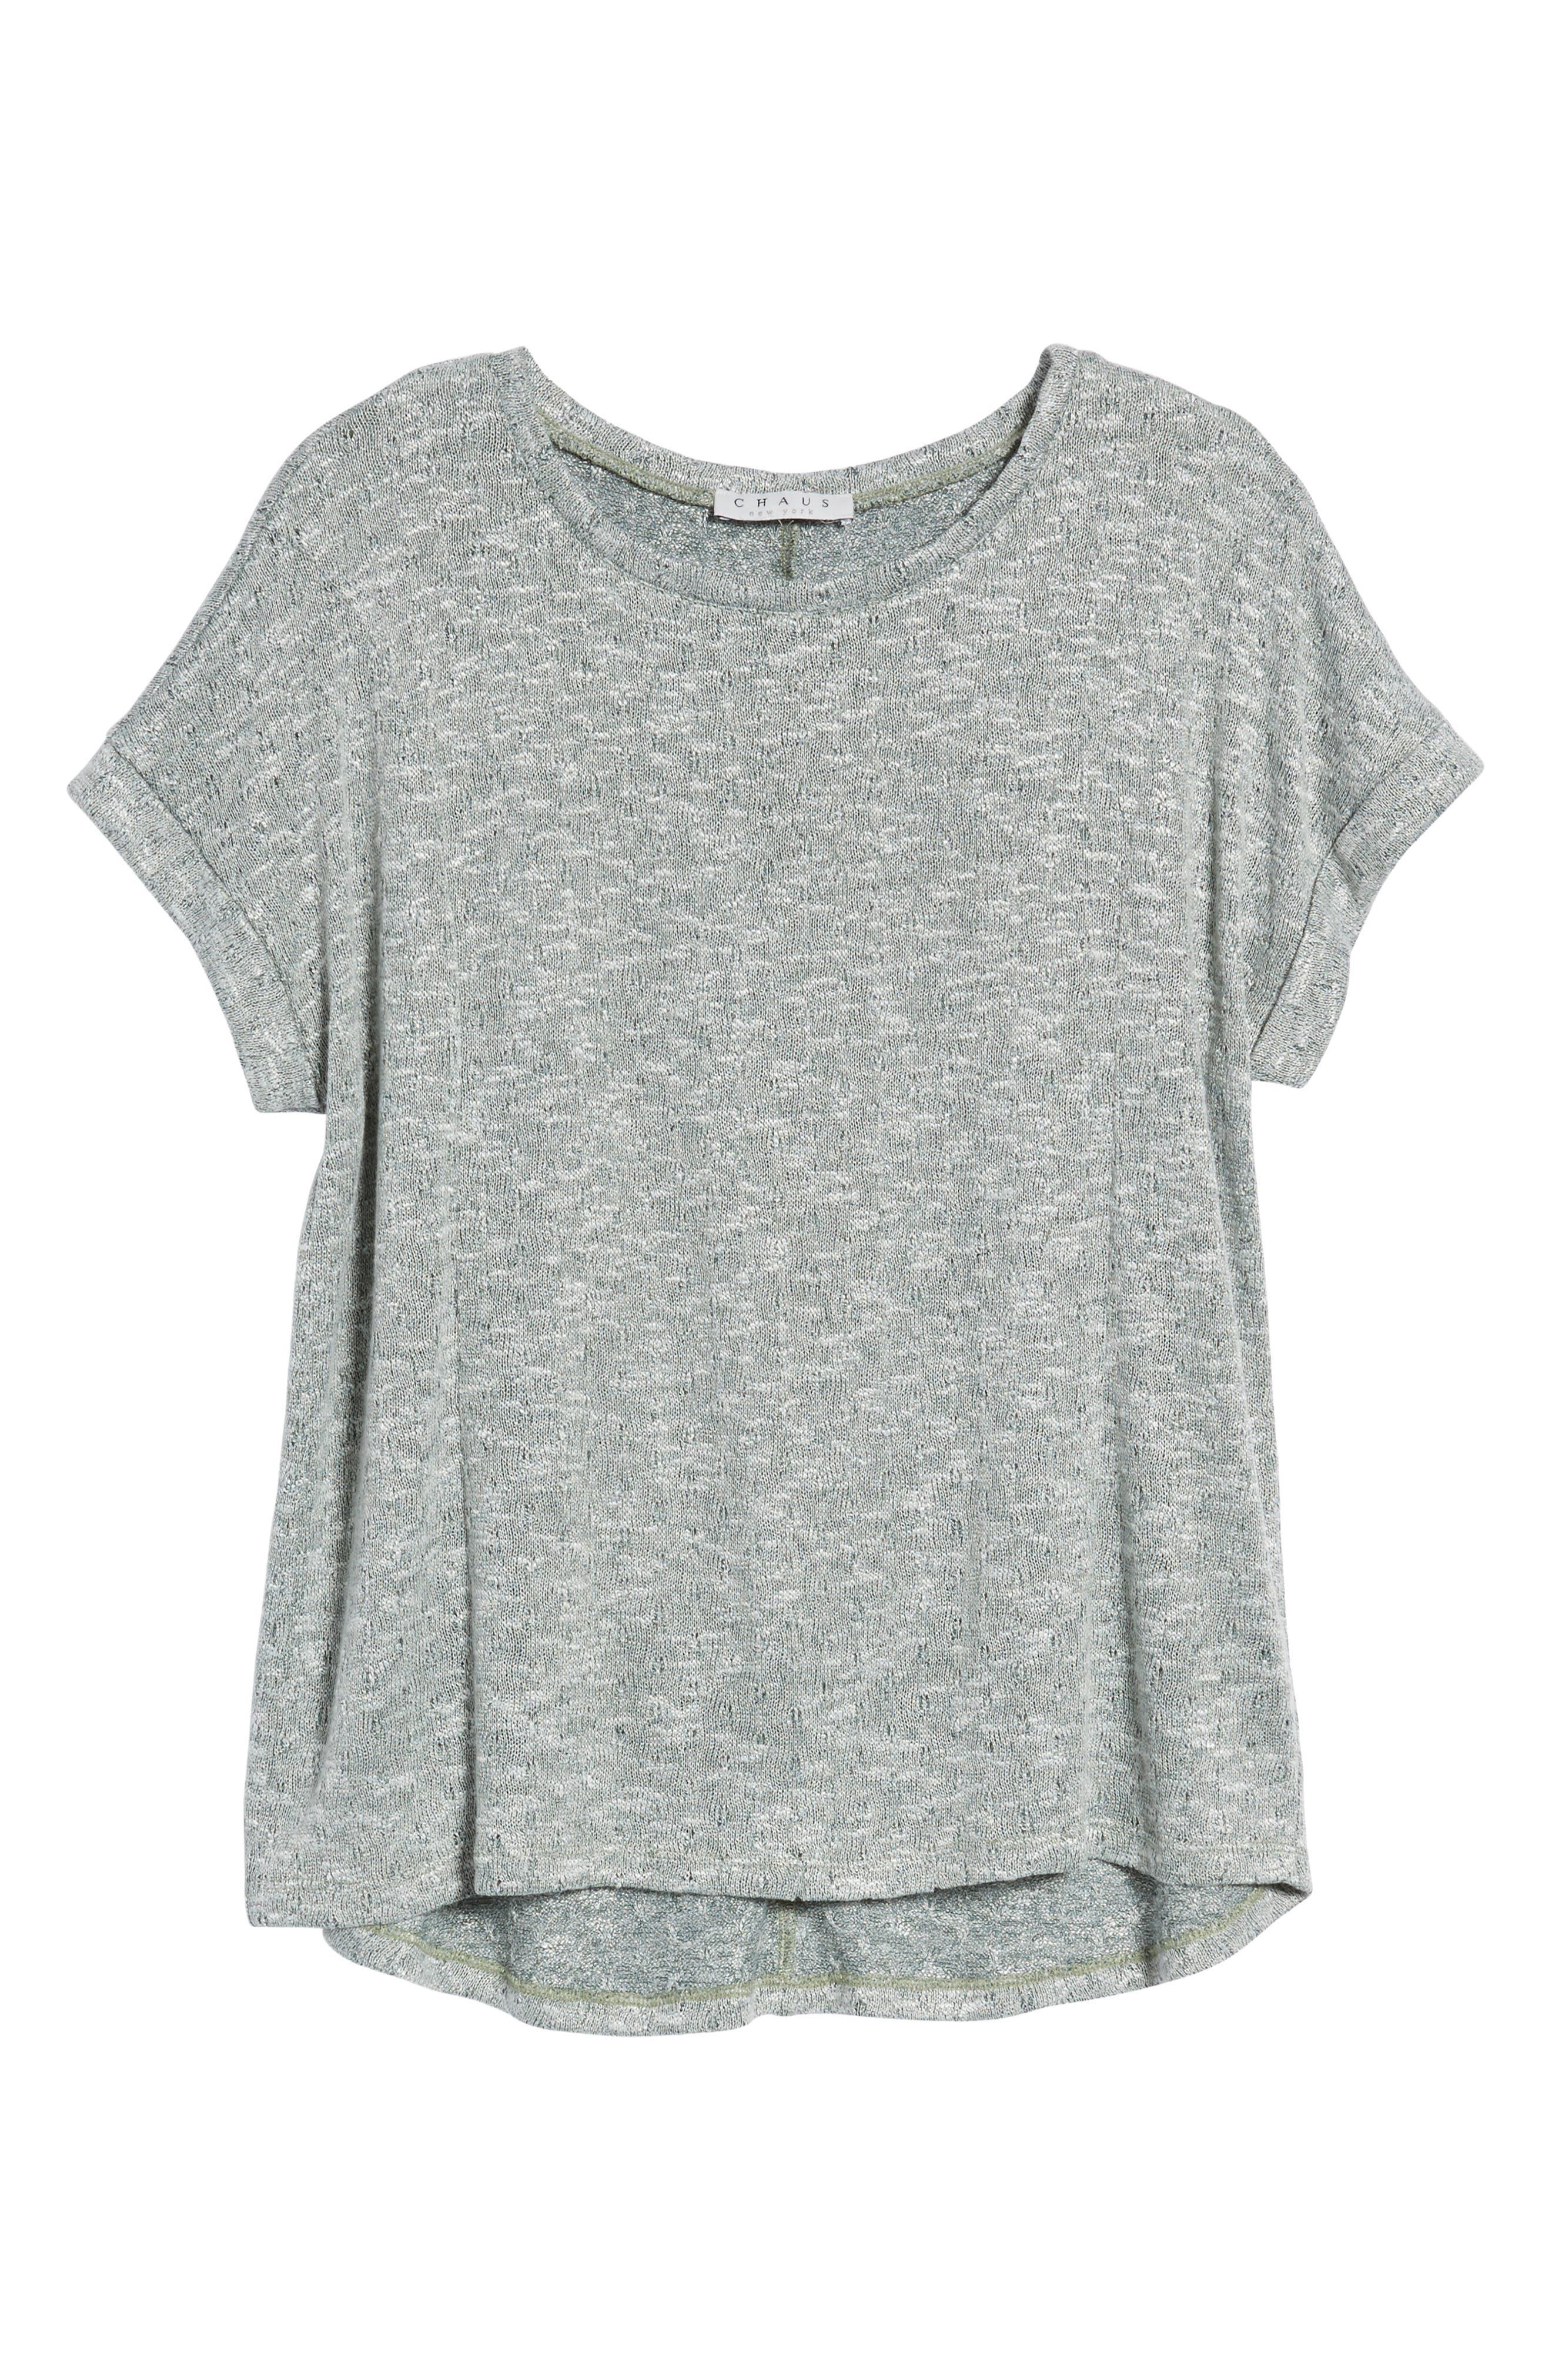 Marled Knit Short Sleeve Top,                             Alternate thumbnail 7, color,